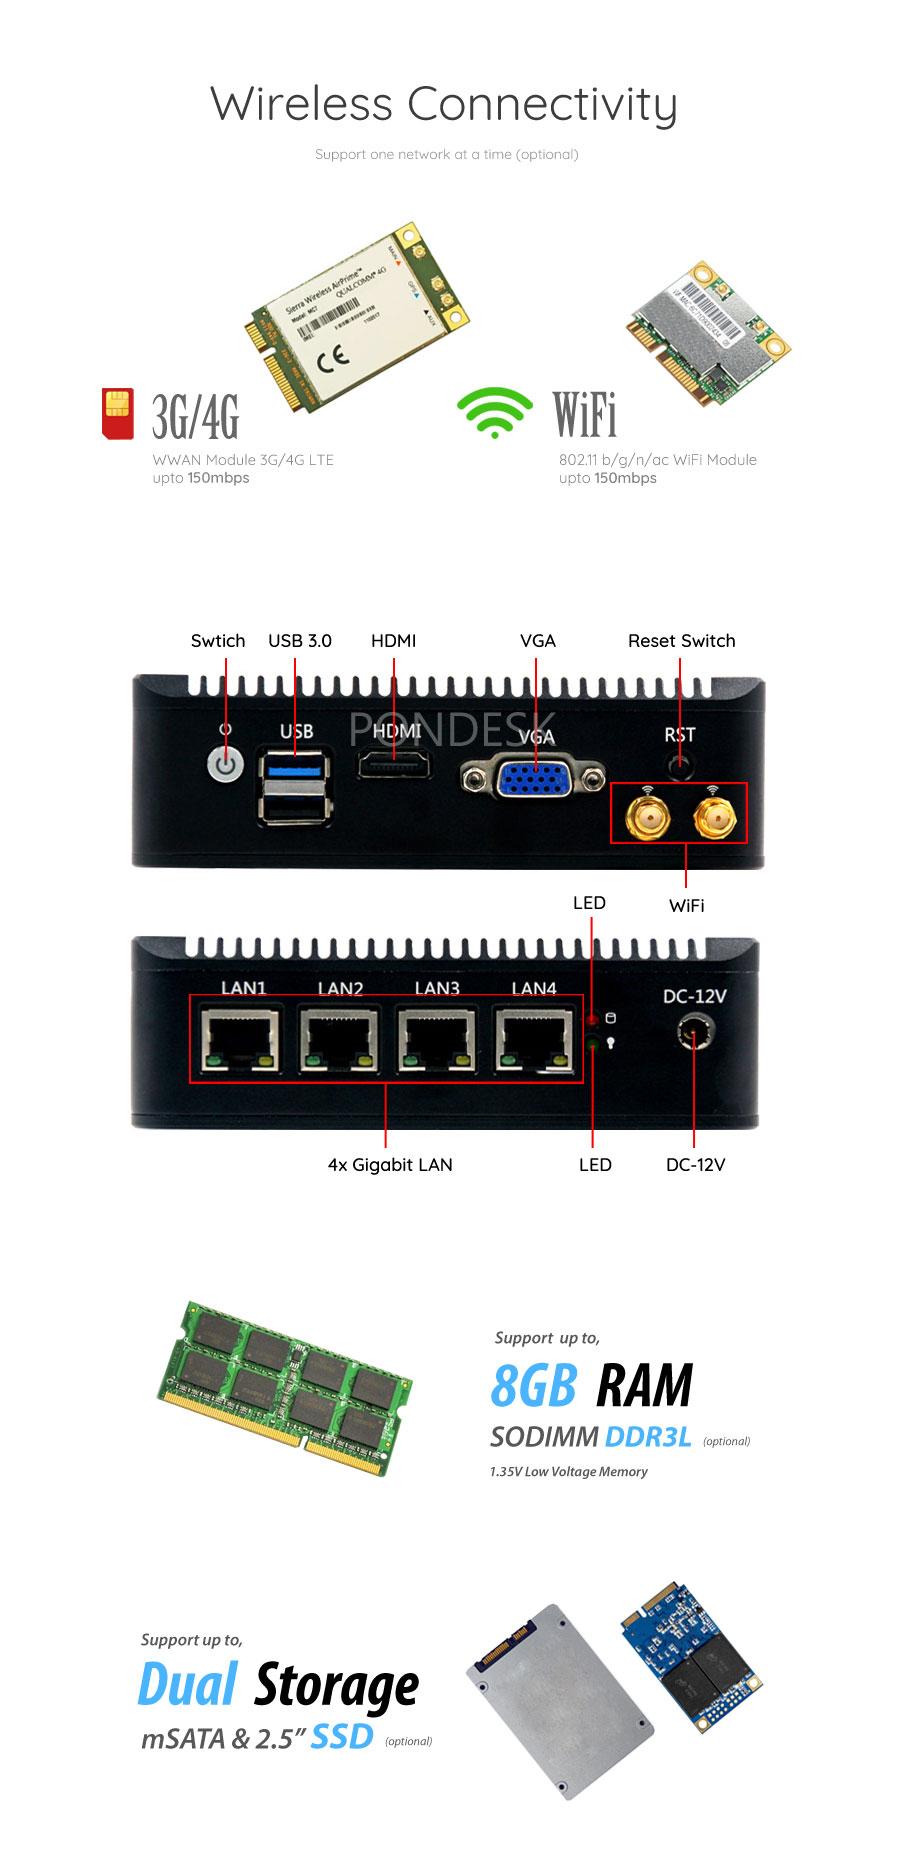 Intel Atom® E3845 4 LAN 3G/4G HD Fanless Firewall Router - MNHO-048 | Image